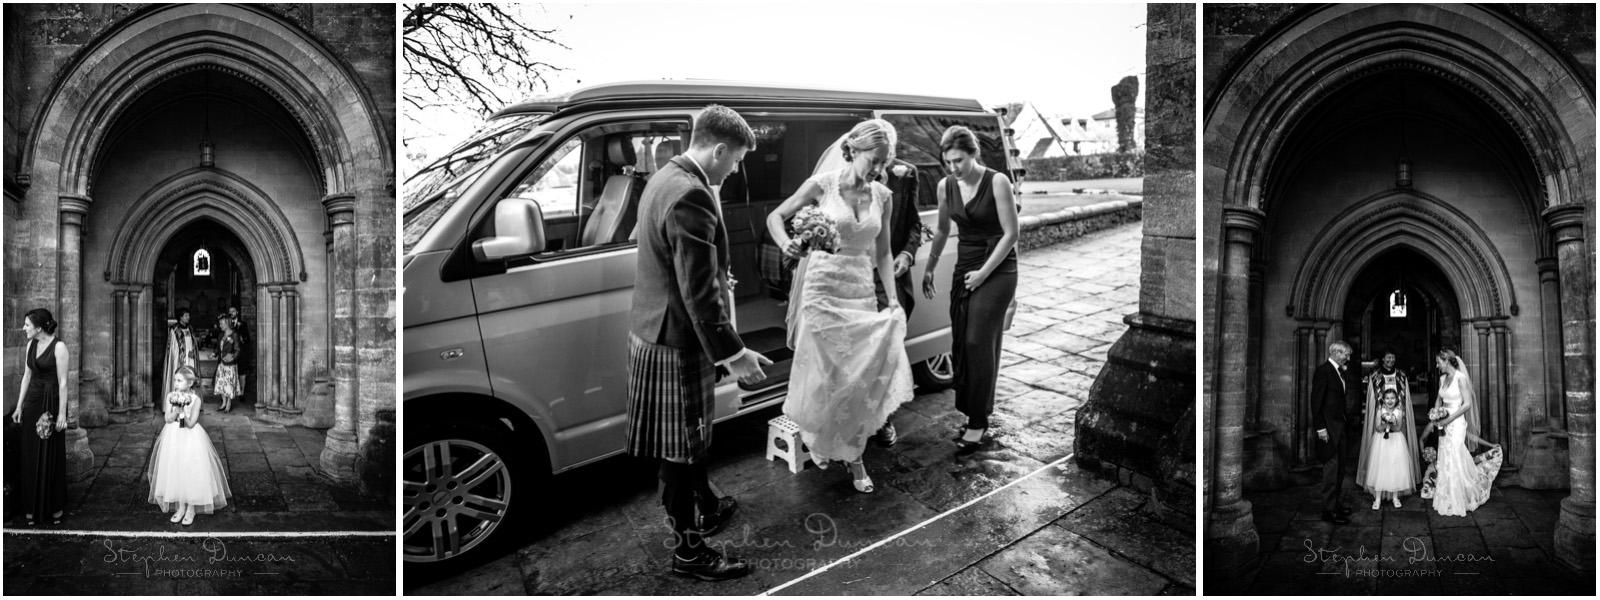 Romsey Abbey wedding photographer bride arrives